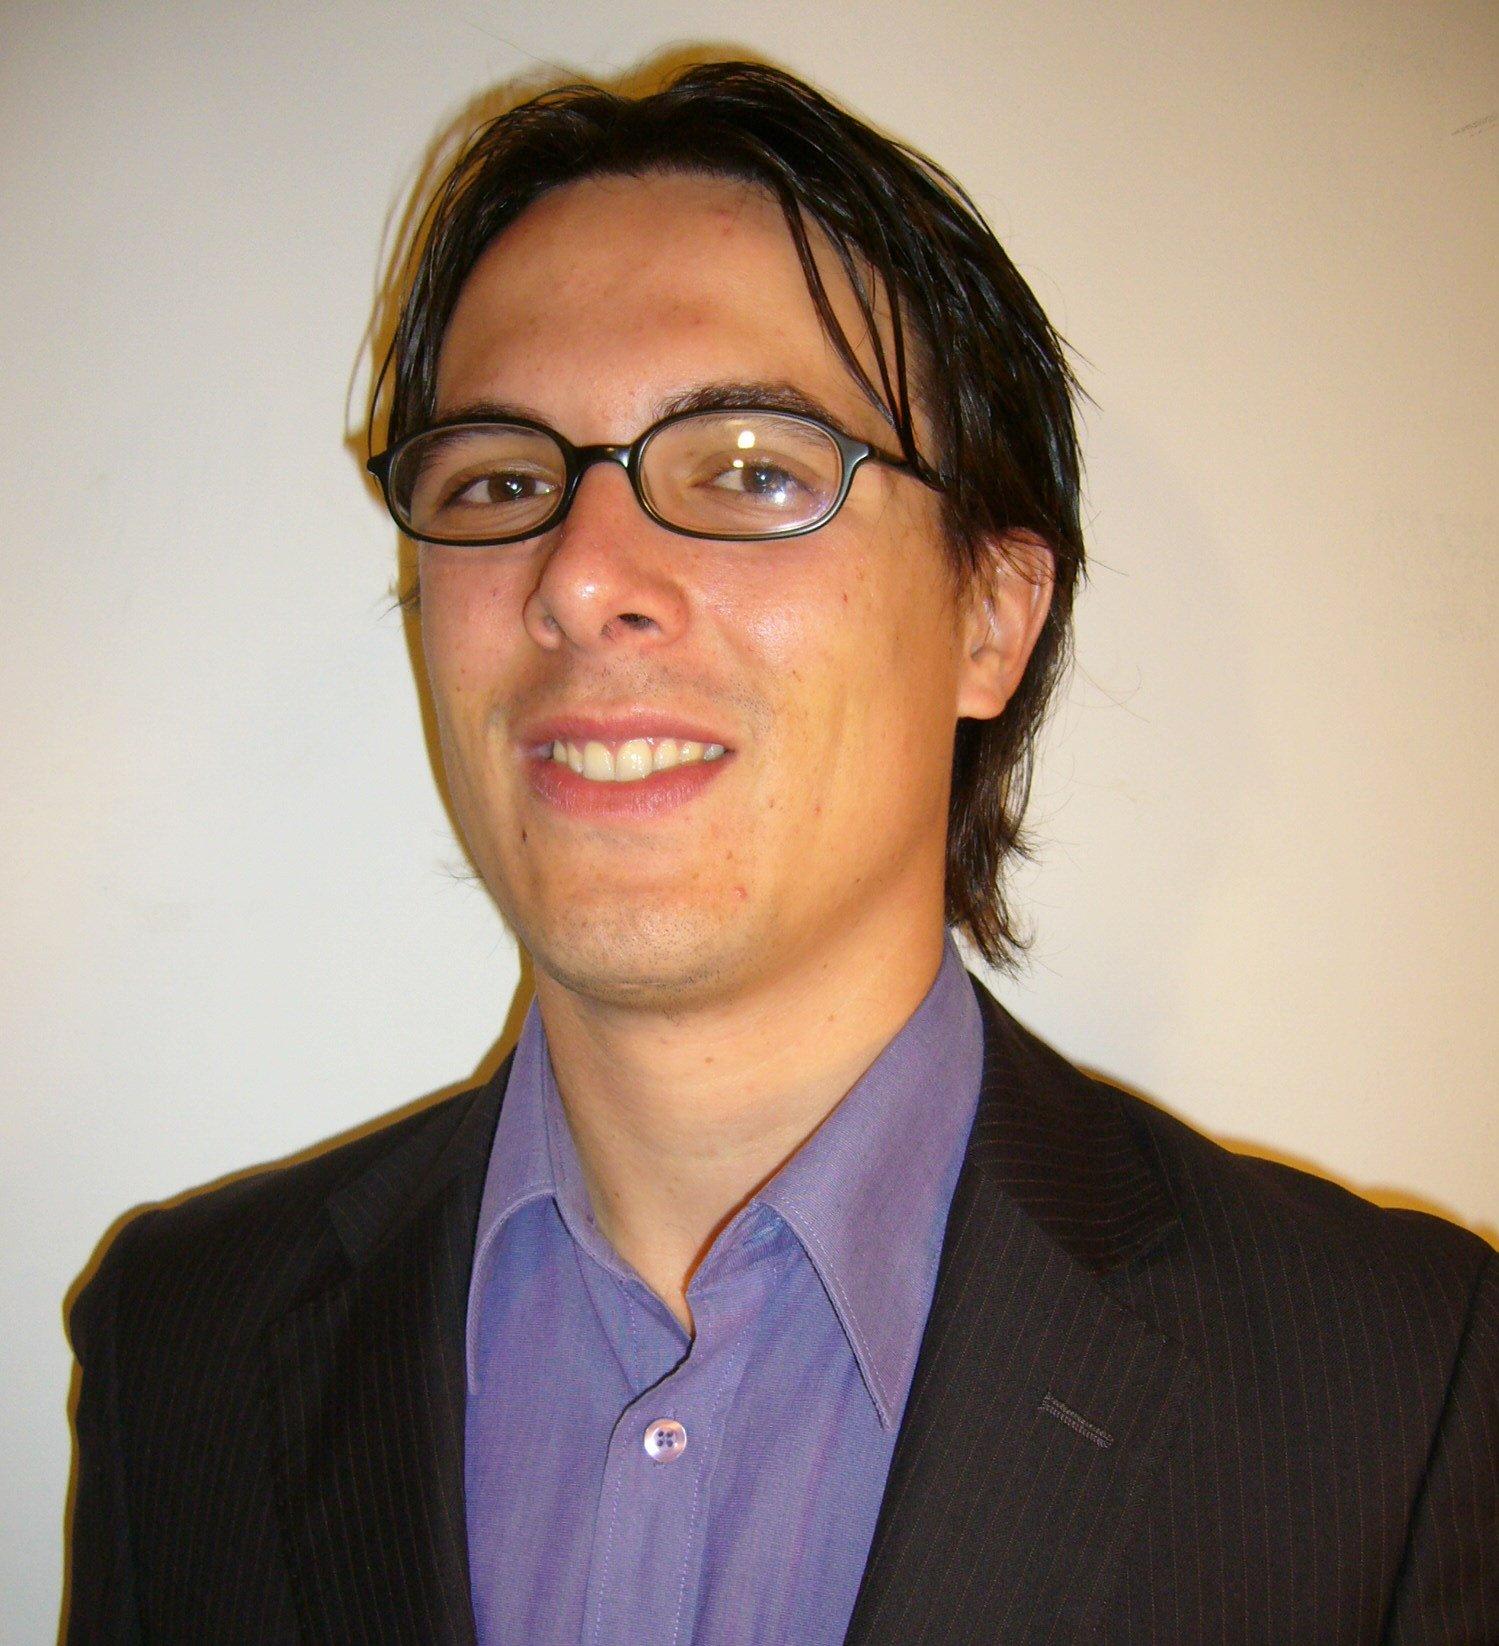 Pablo Cebrian Electronic Telecoms and Mechatronics MsC